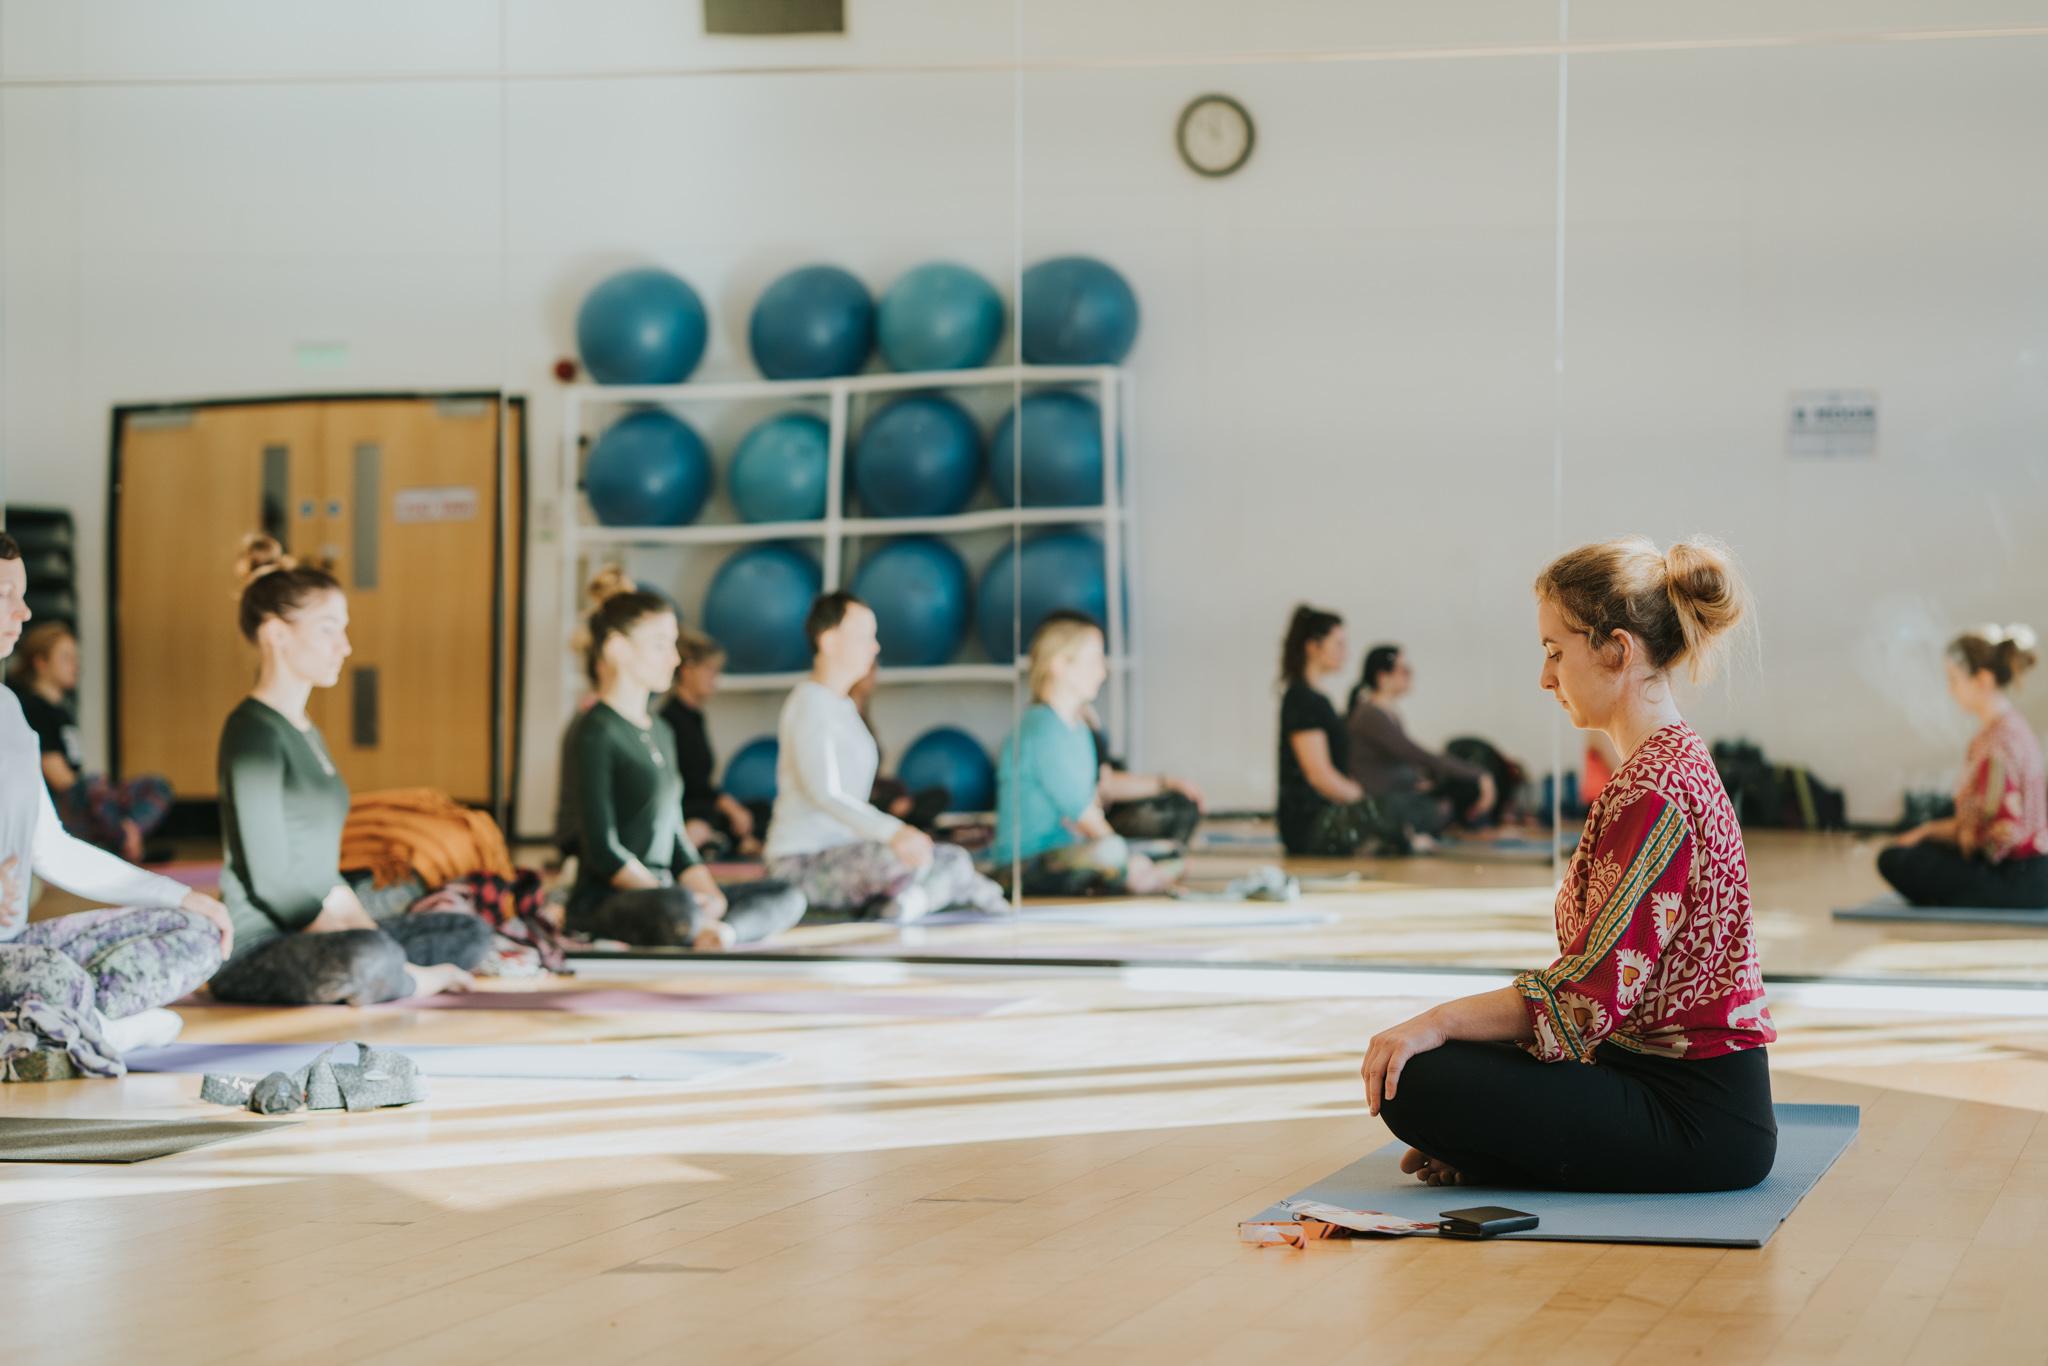 yogific-essex-yoga-vegan-festival-essex-university-grace-elizabeth-colchester-essex-alternative-wedding-lifestyle-photographer-suffolk-norfolk-devon-london-vegan-nights-cruelty-free (2 of 73).jpg